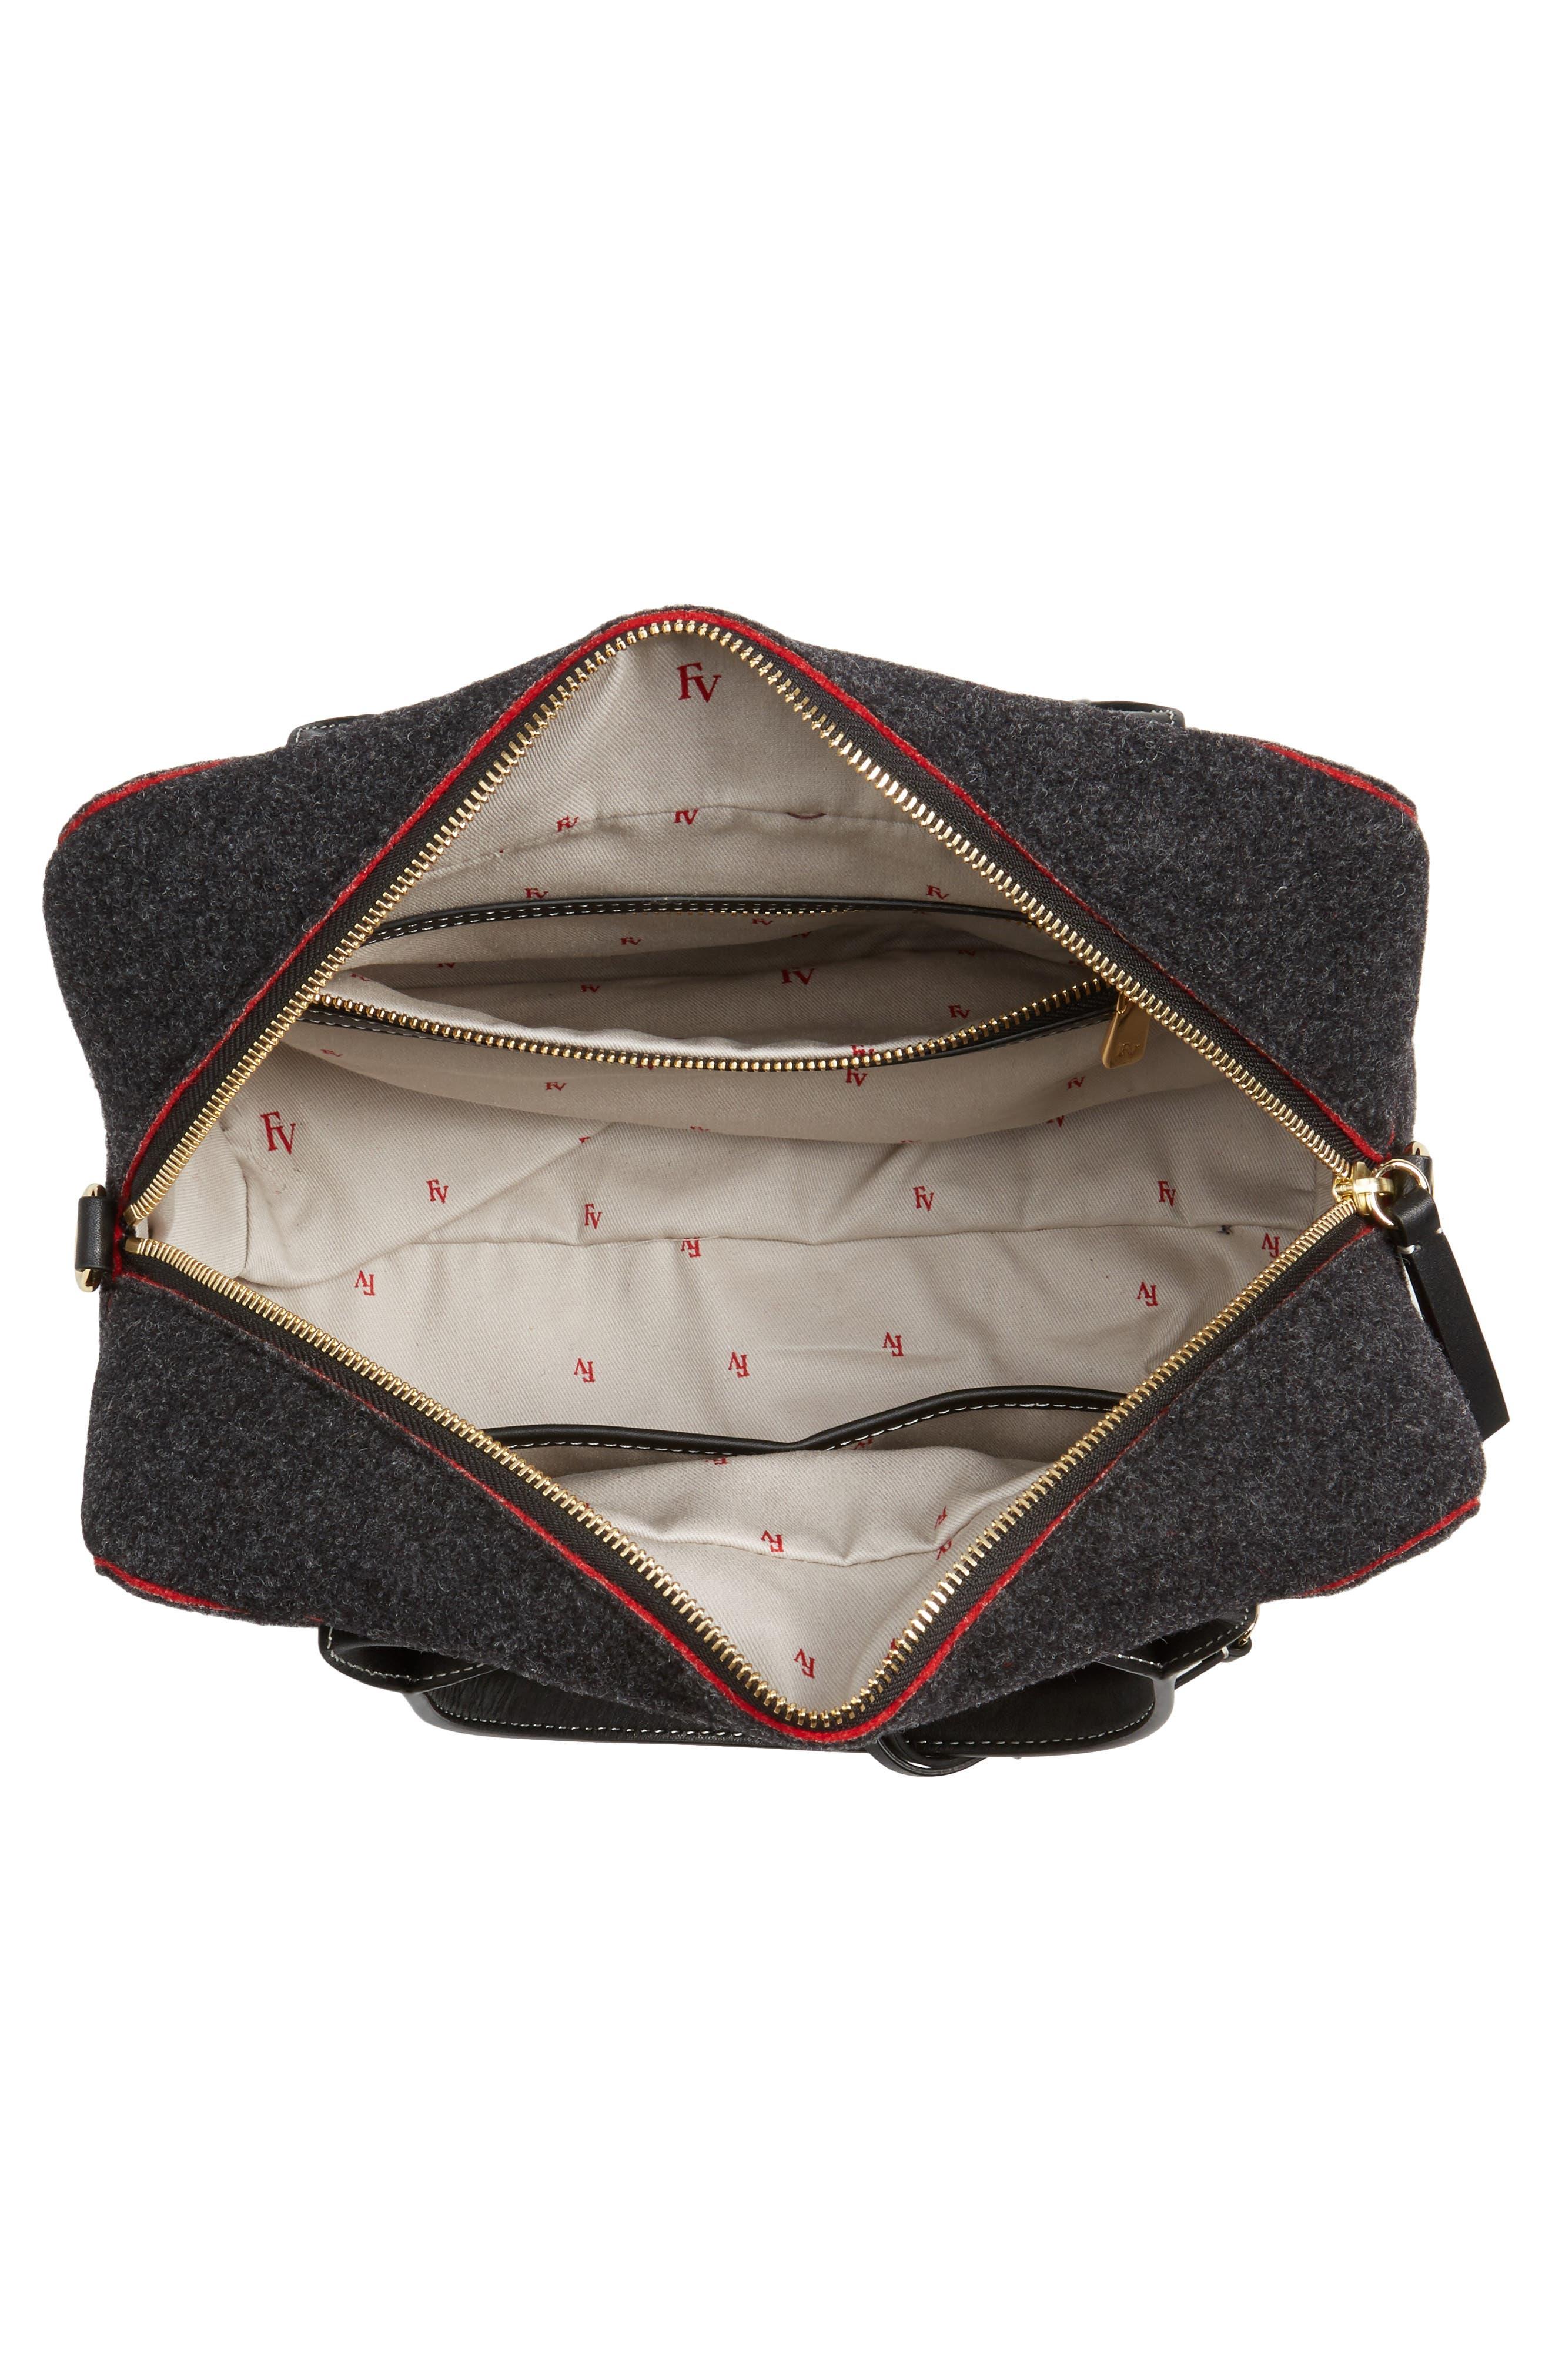 Medium Wool & Leather Satchel,                             Alternate thumbnail 4, color,                             020